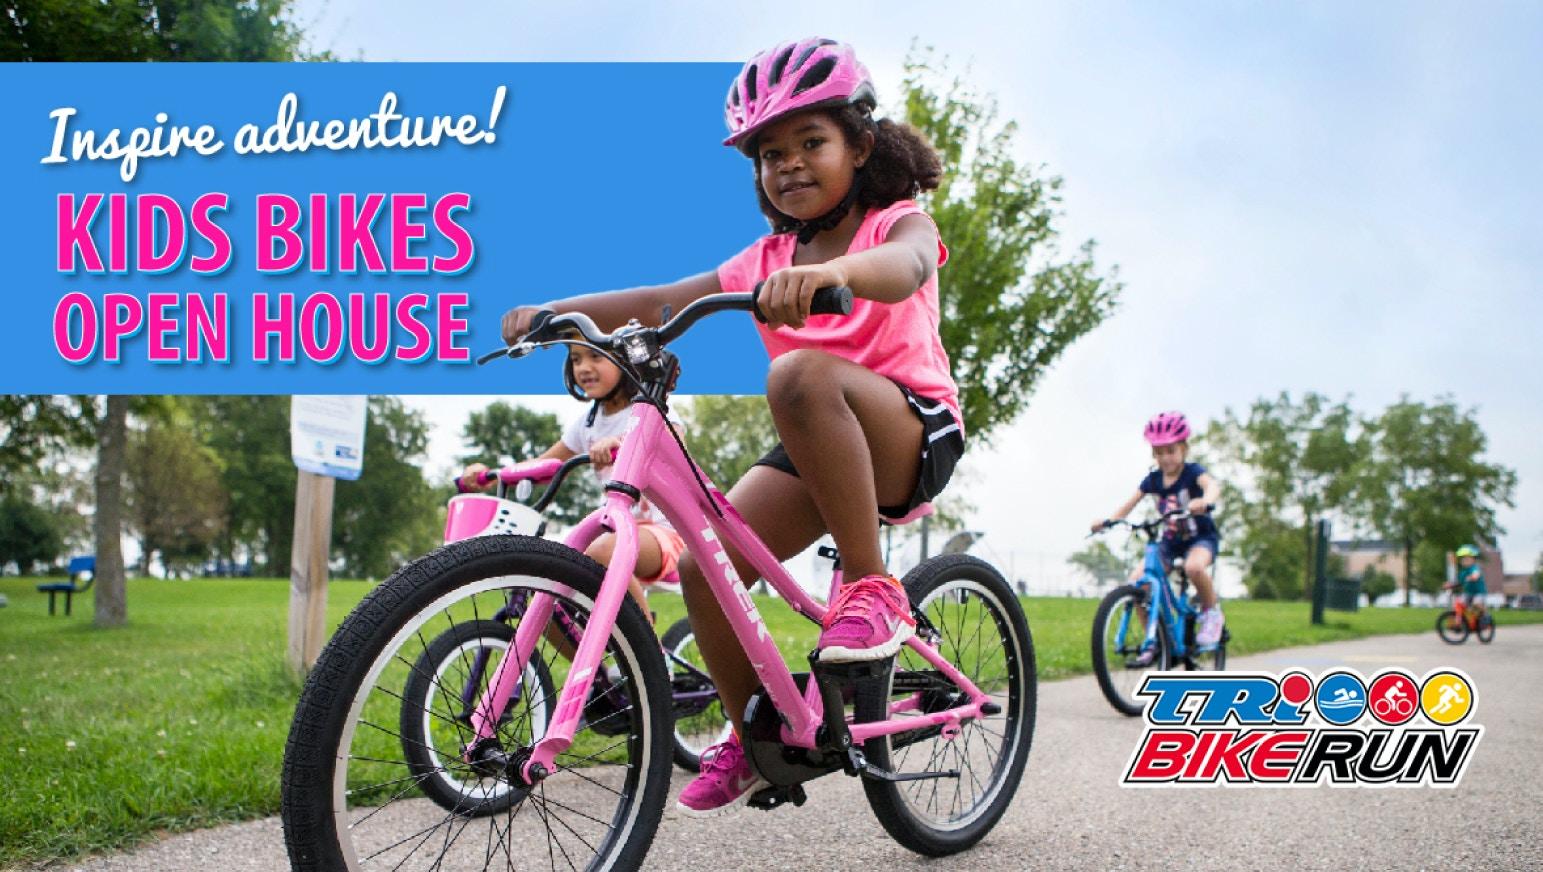 Kids' Bikes Open House at Tri Bike Run this May!